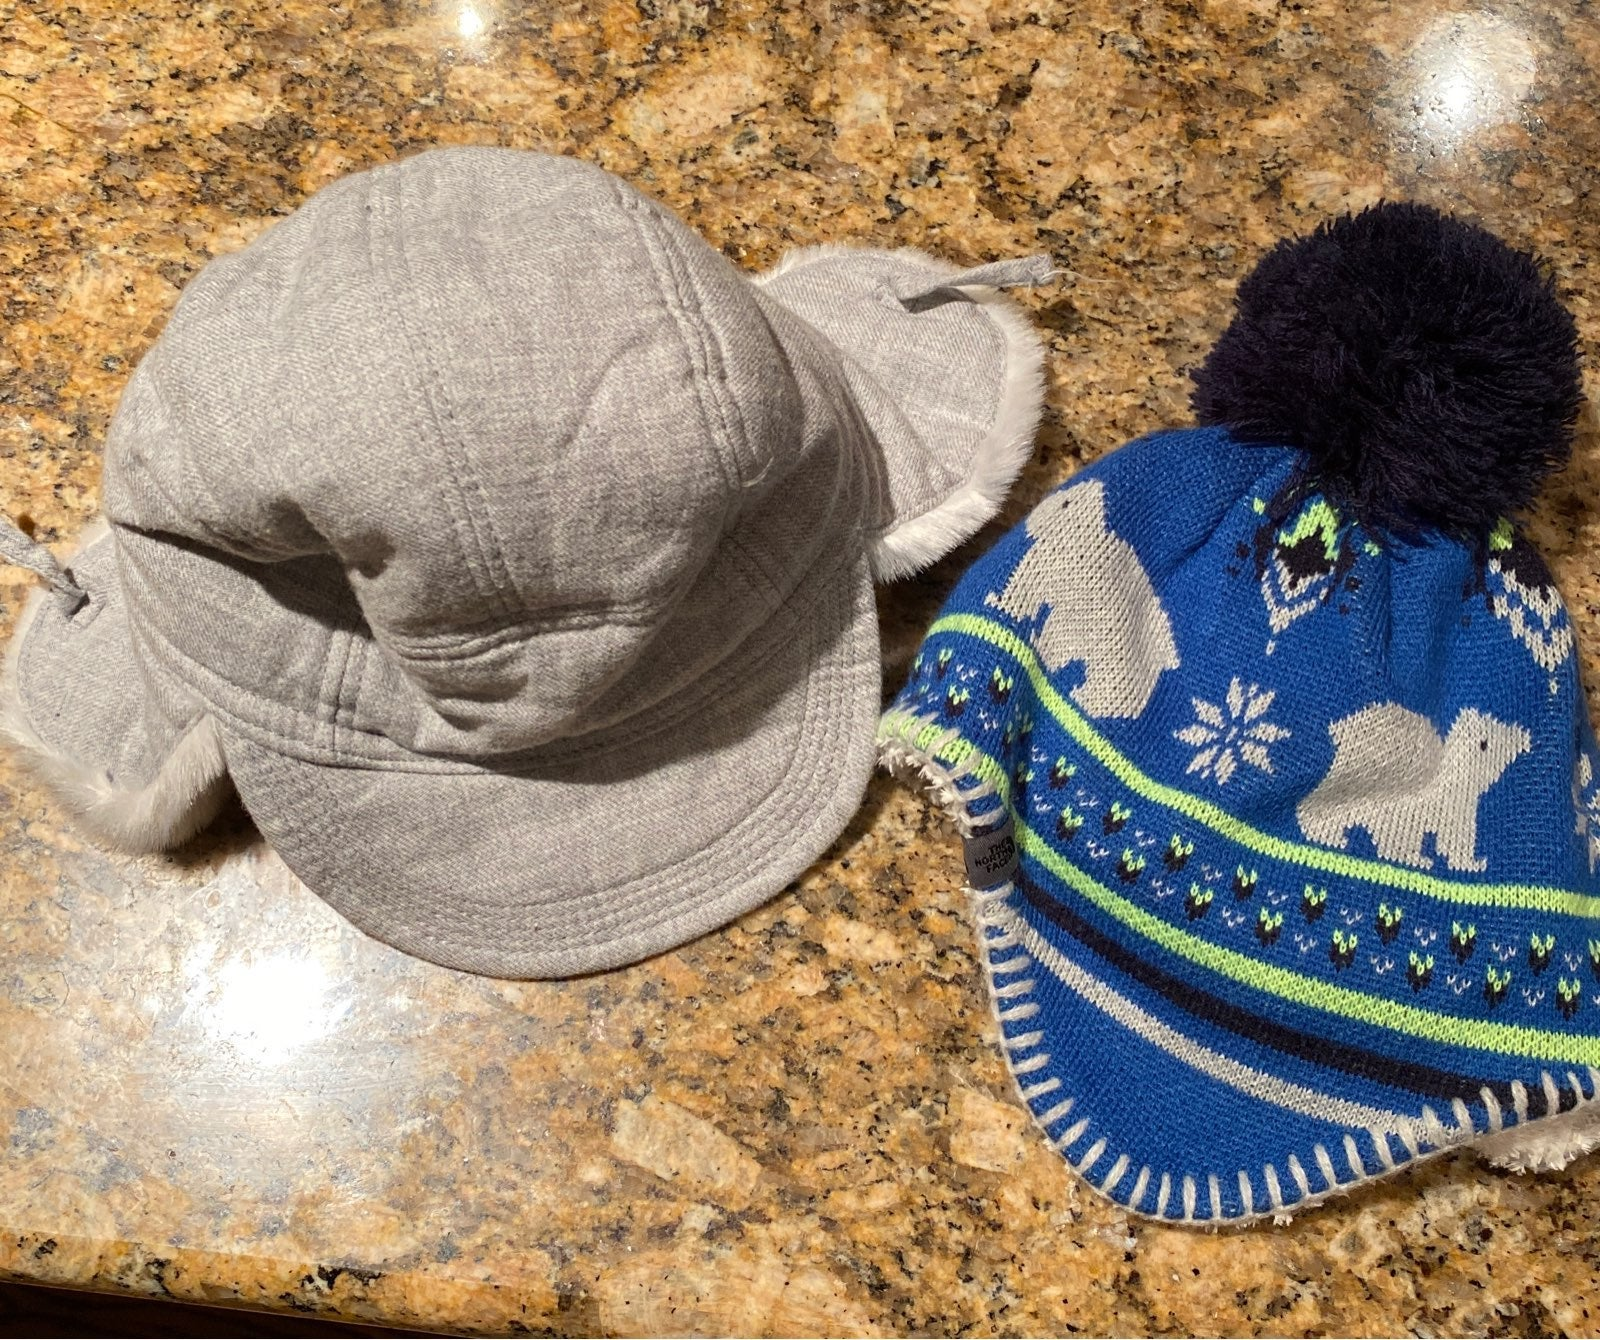 2 baby boy winter hats northface and gap